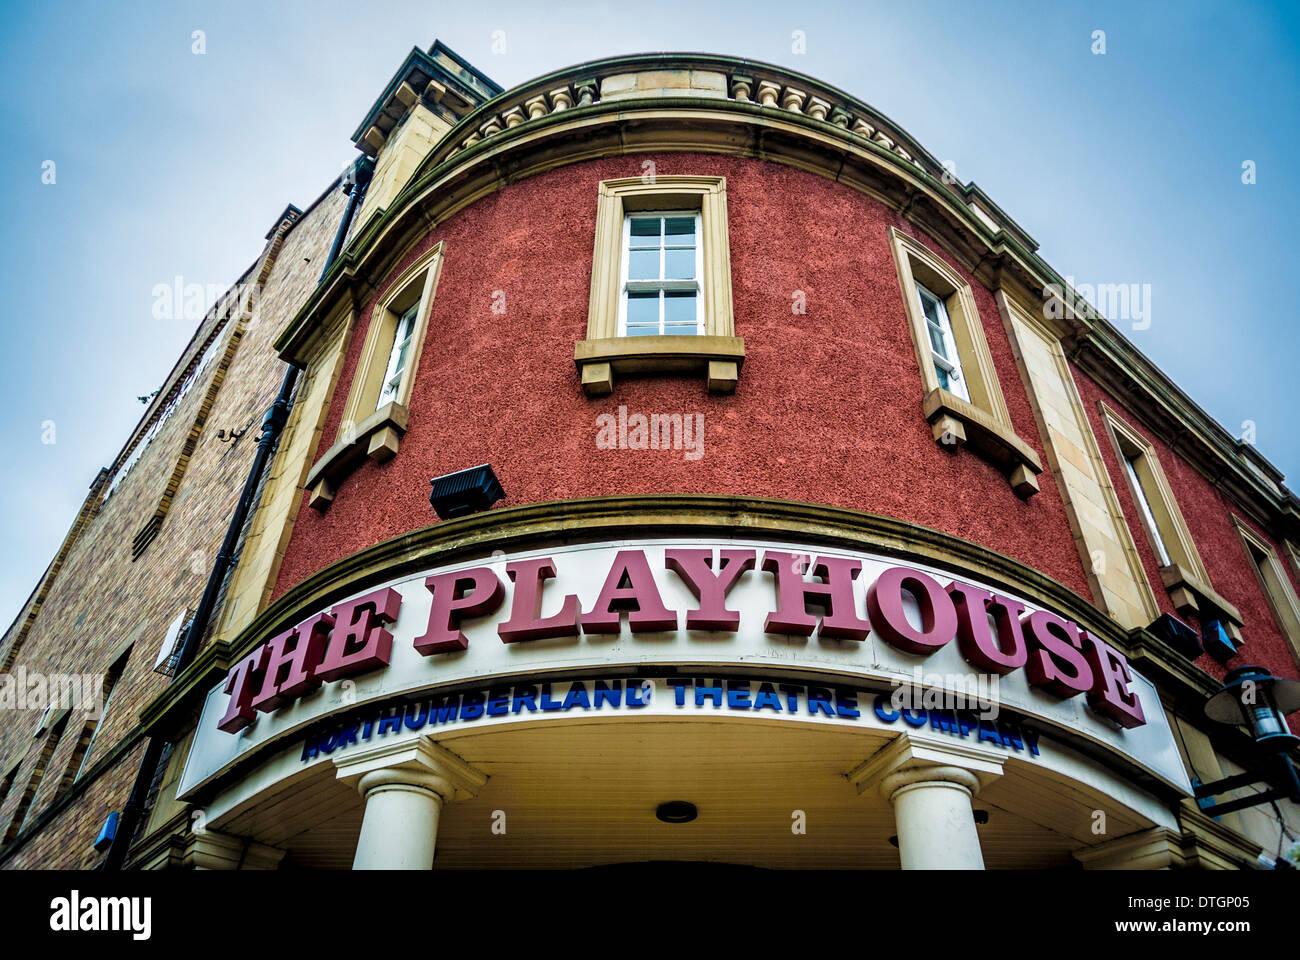 The Playhouse Theatre, Alnwick, Northumberland, UK. - Stock Image